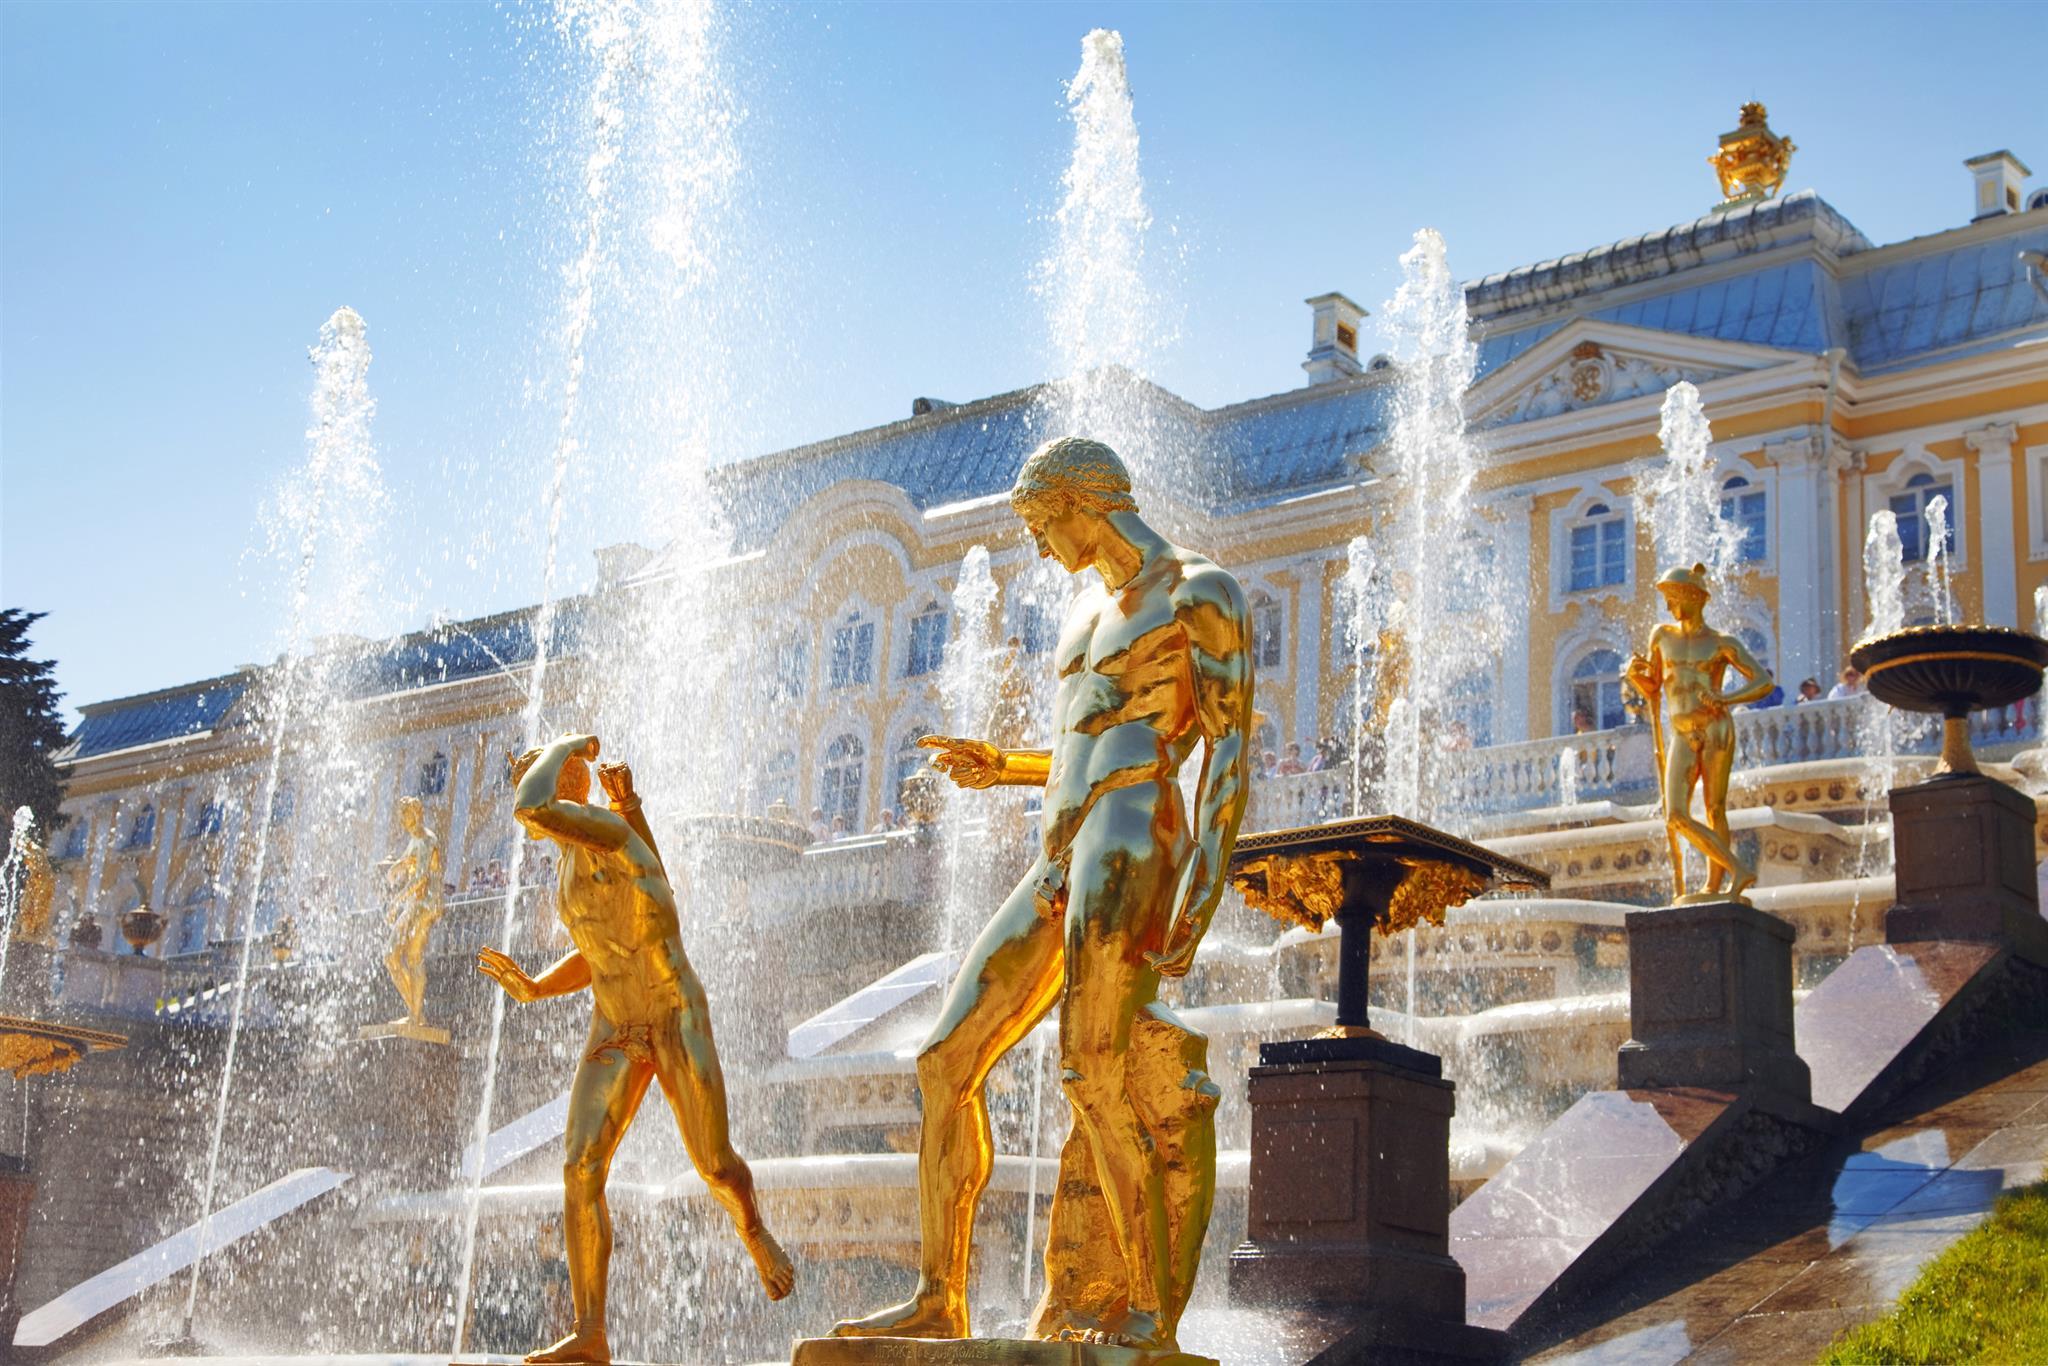 Dreamstime © - Saint-Pétersbourg - Peterhof - Jardins et fontaines (5)